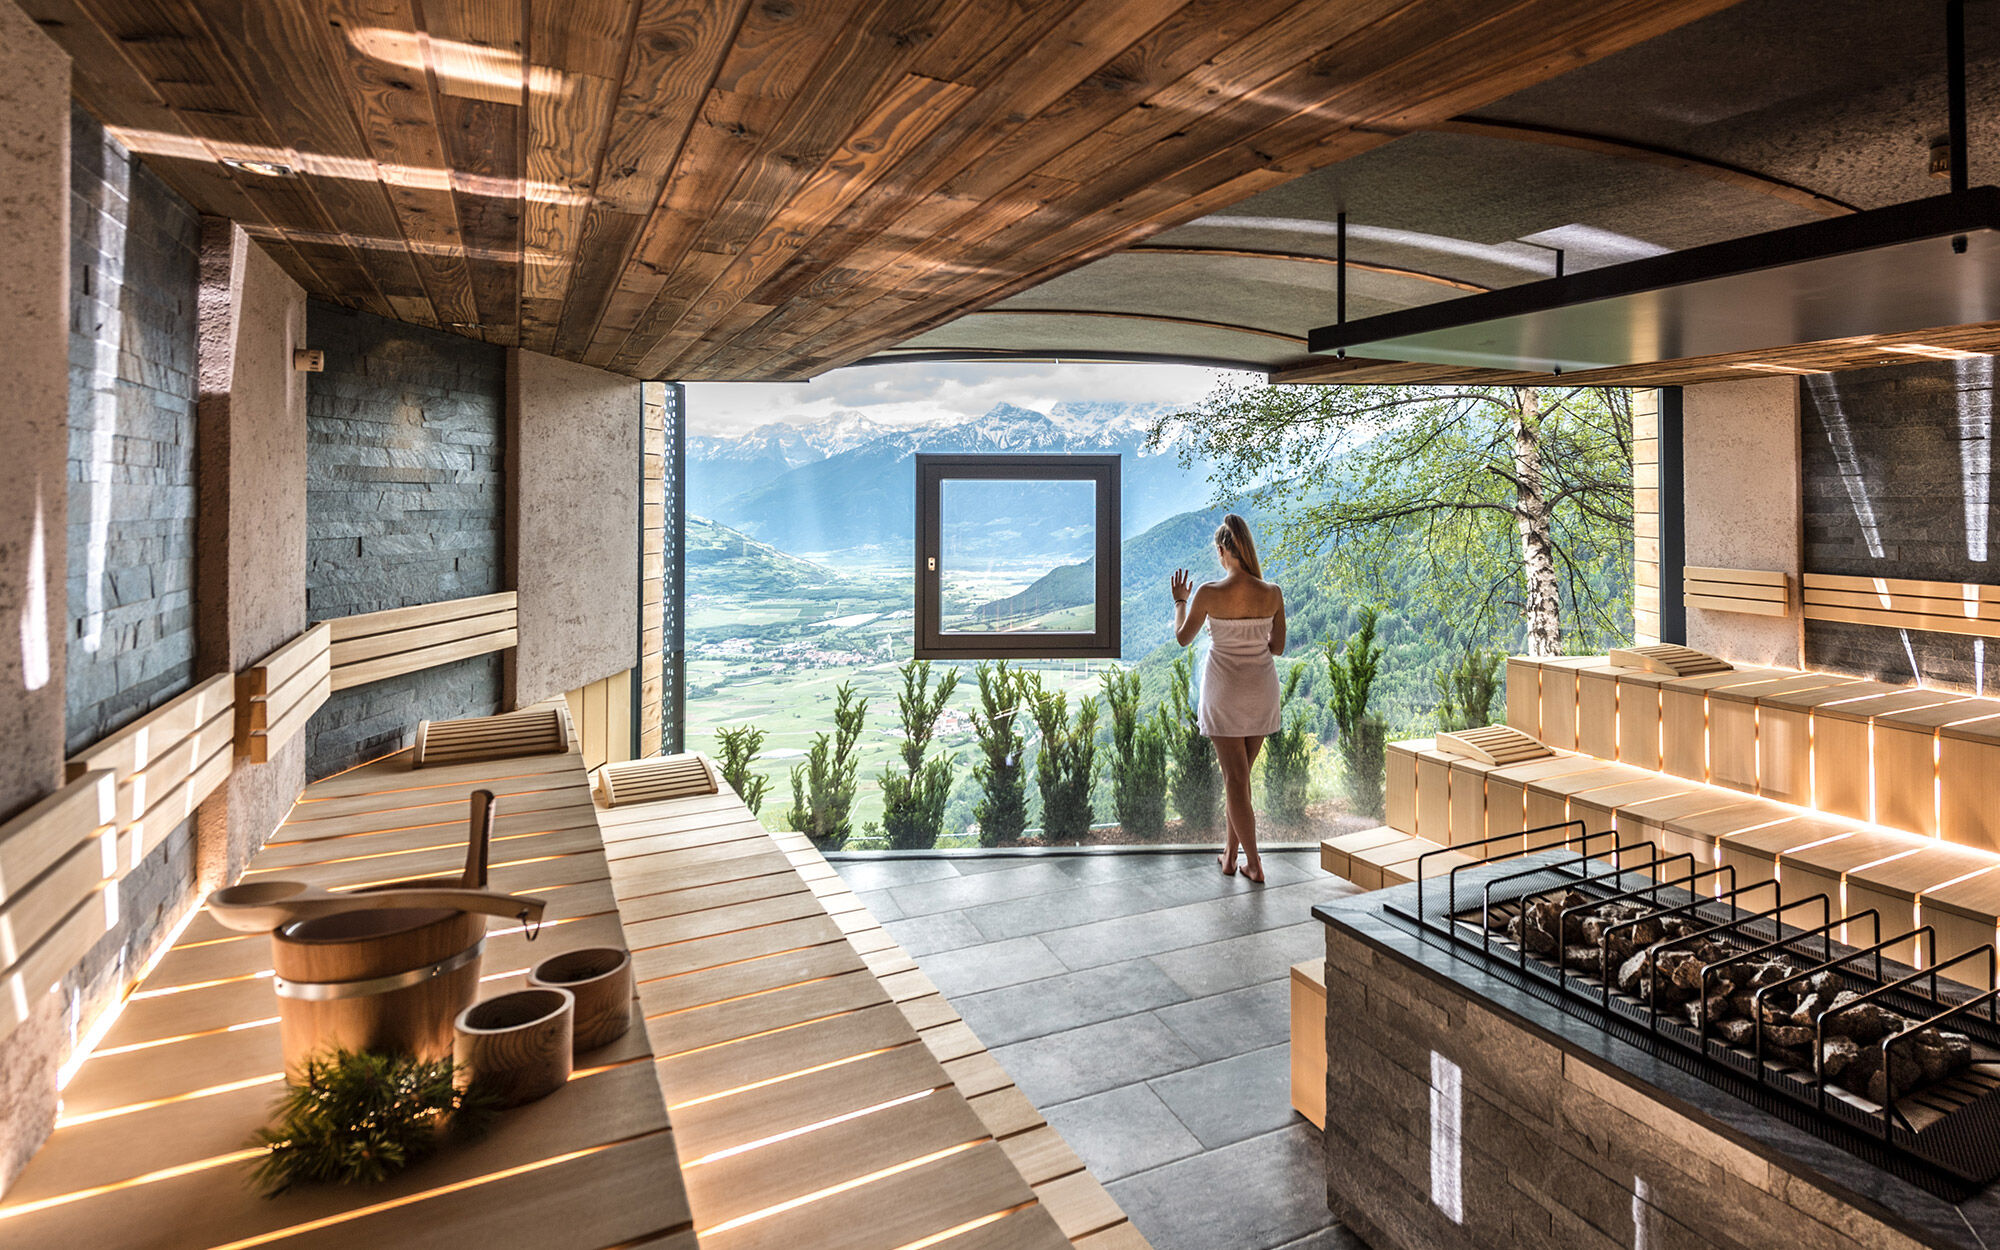 Erstklassige wellness in s dtirol im hotel das gerstl for Design wellnesshotel sudtirol